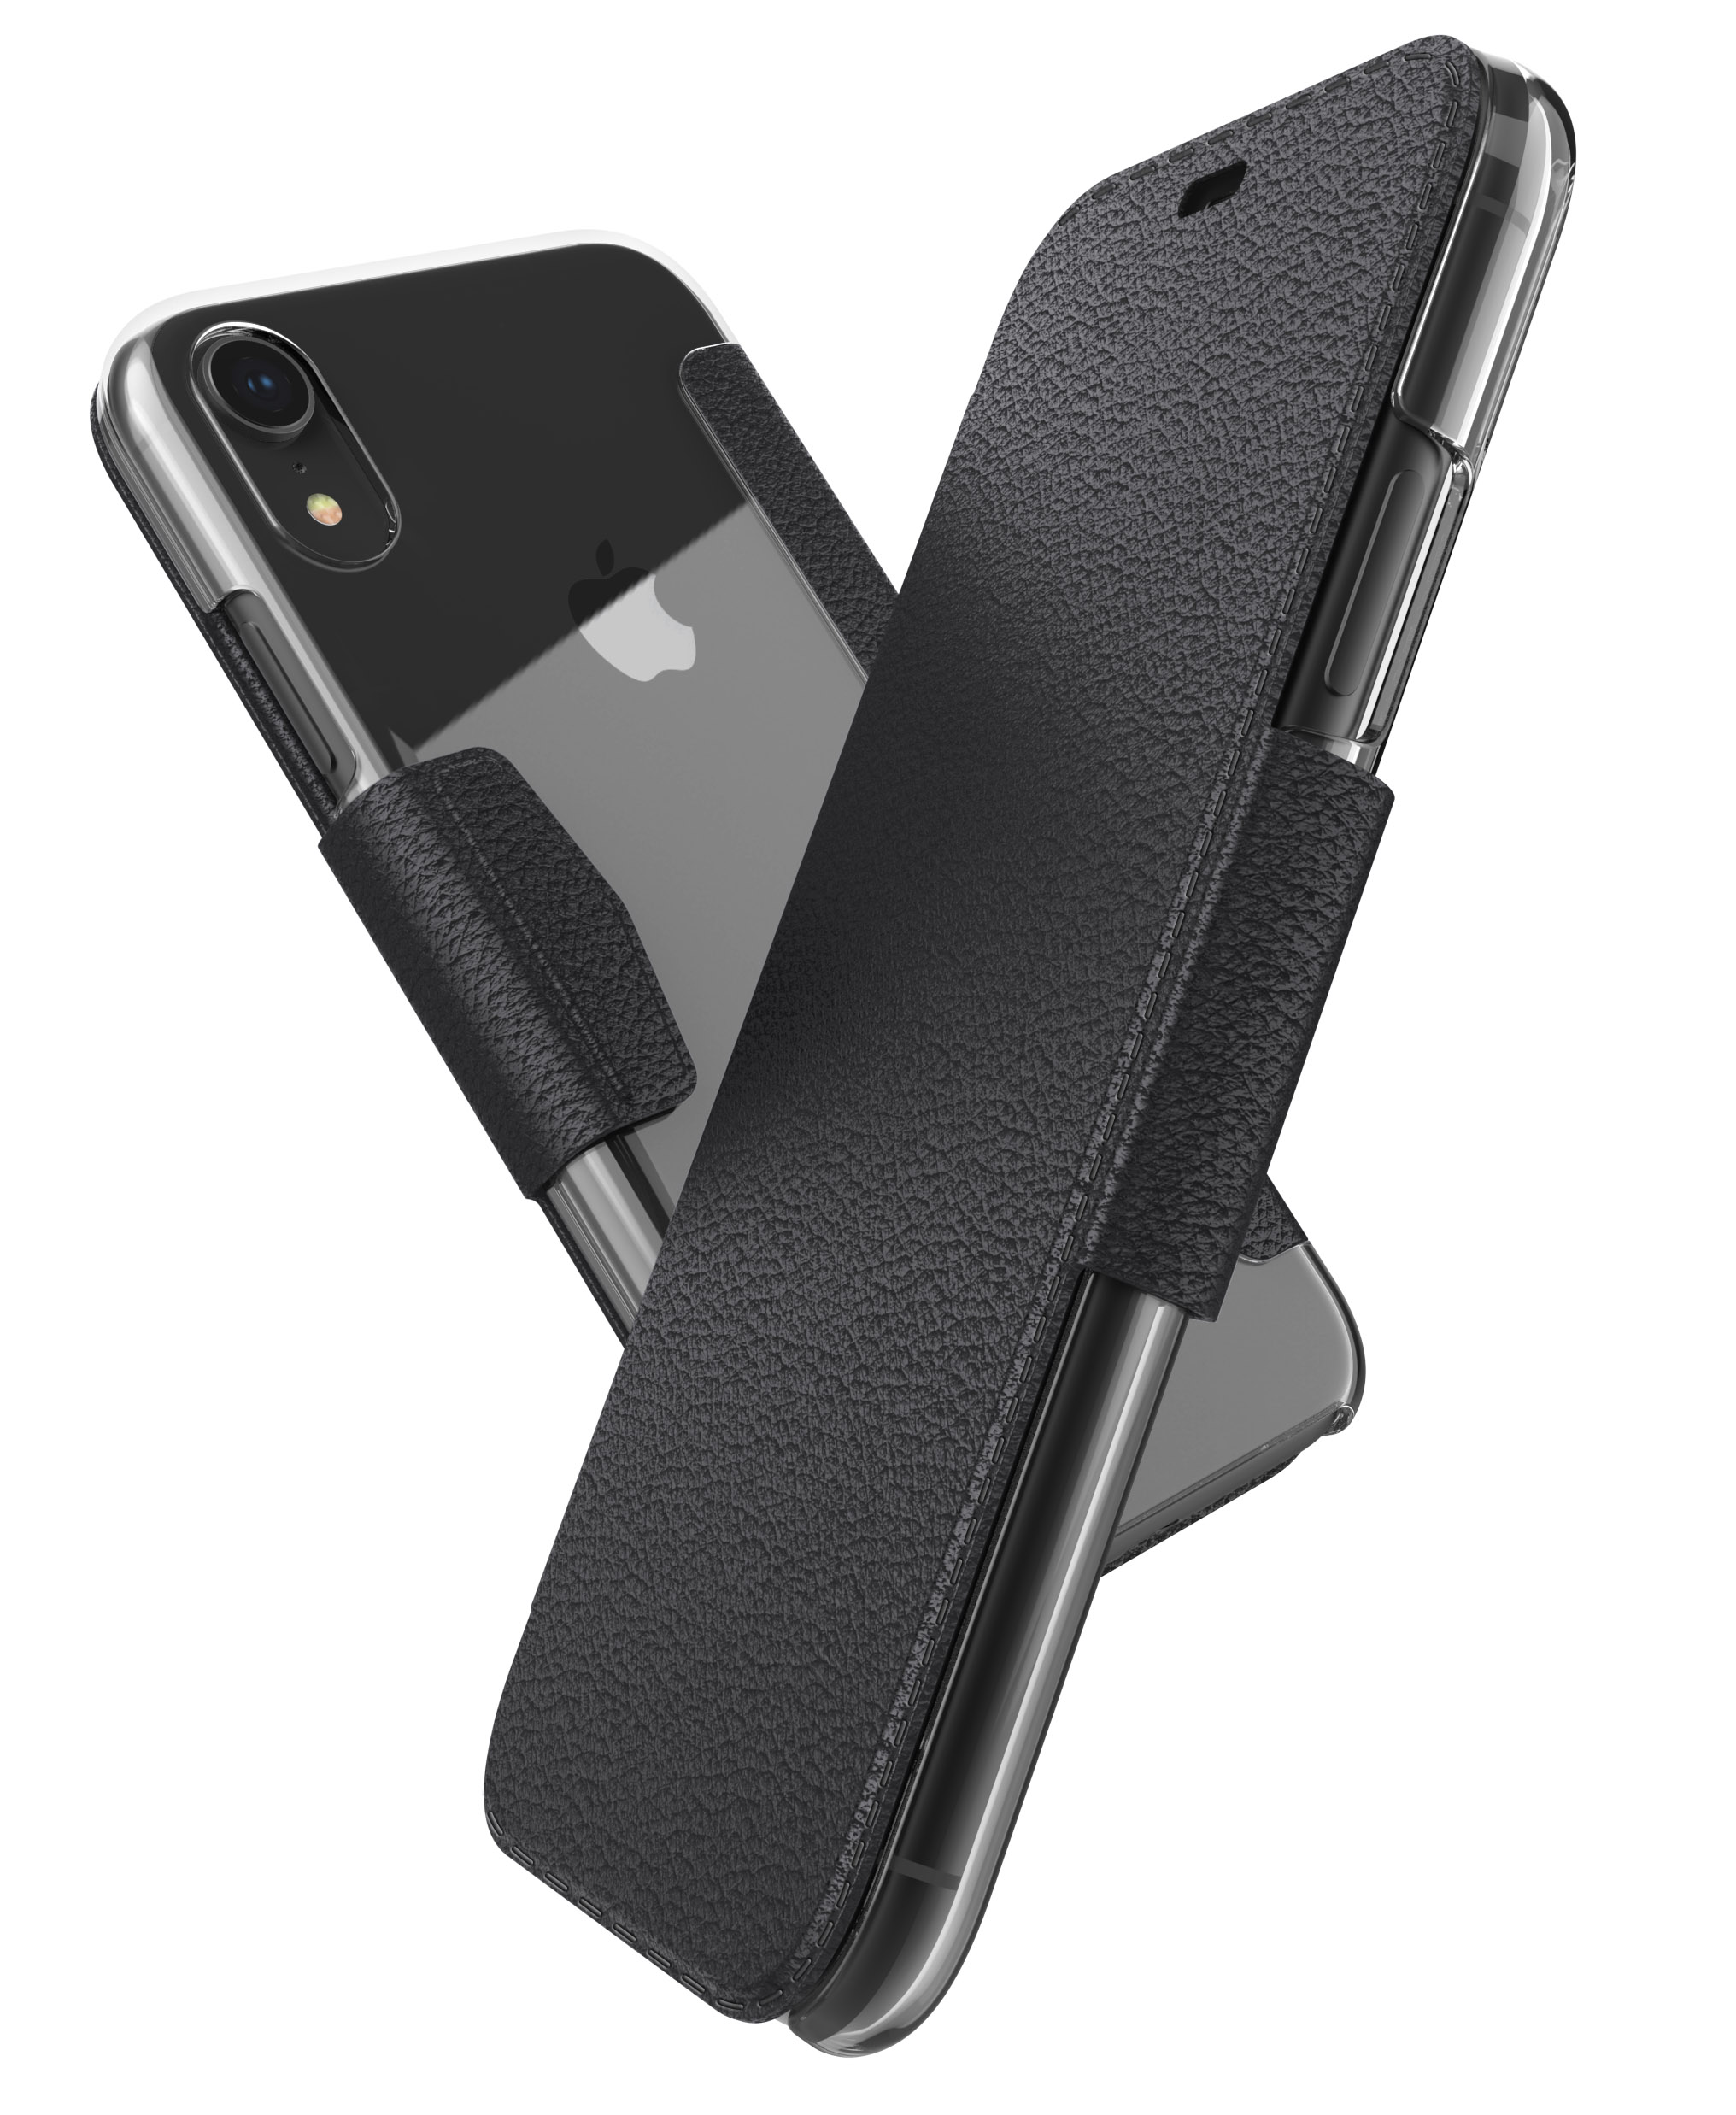 Etui Engage Xdoria iPhone XR noir